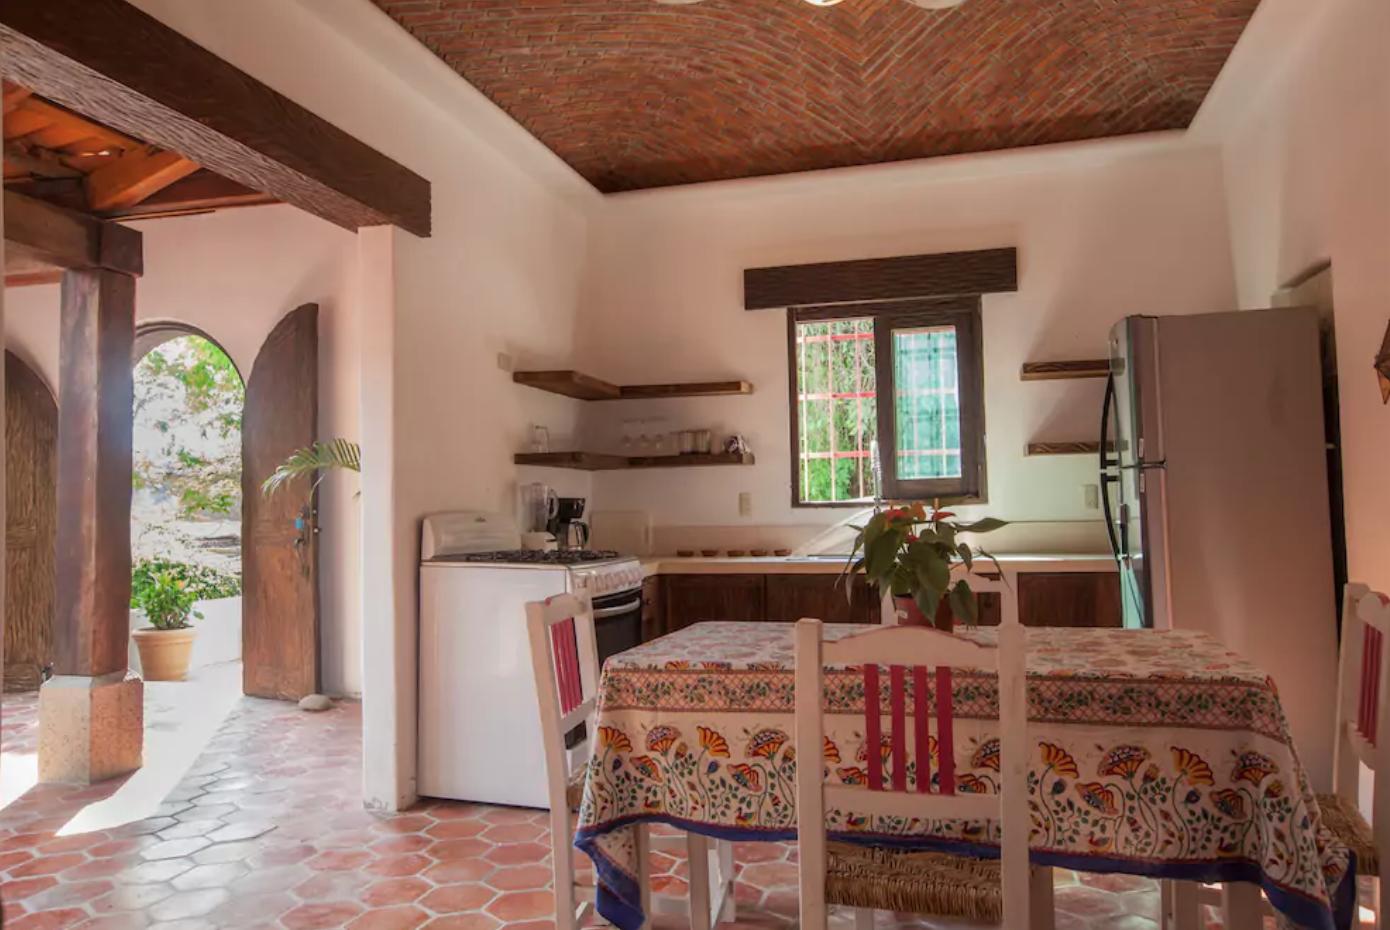 Cocina estilo colonial casa corredor abierto patio central casas e ideas pinterest - Cocinas estilo colonial ...